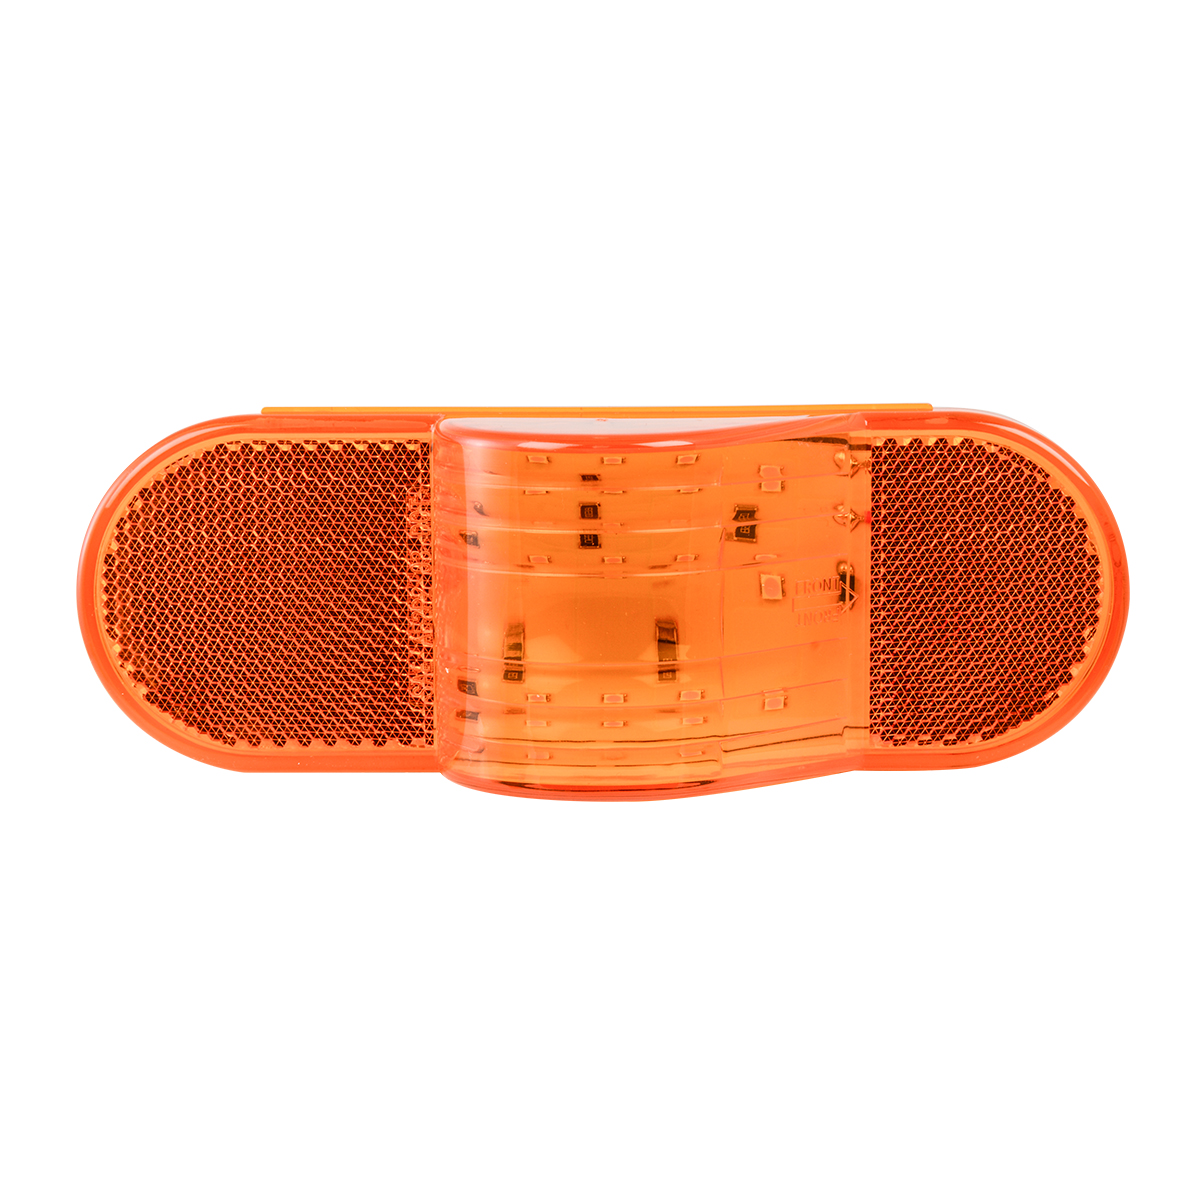 79995 Oval Side Marker & Turn 12 LED Light w/ Reflector